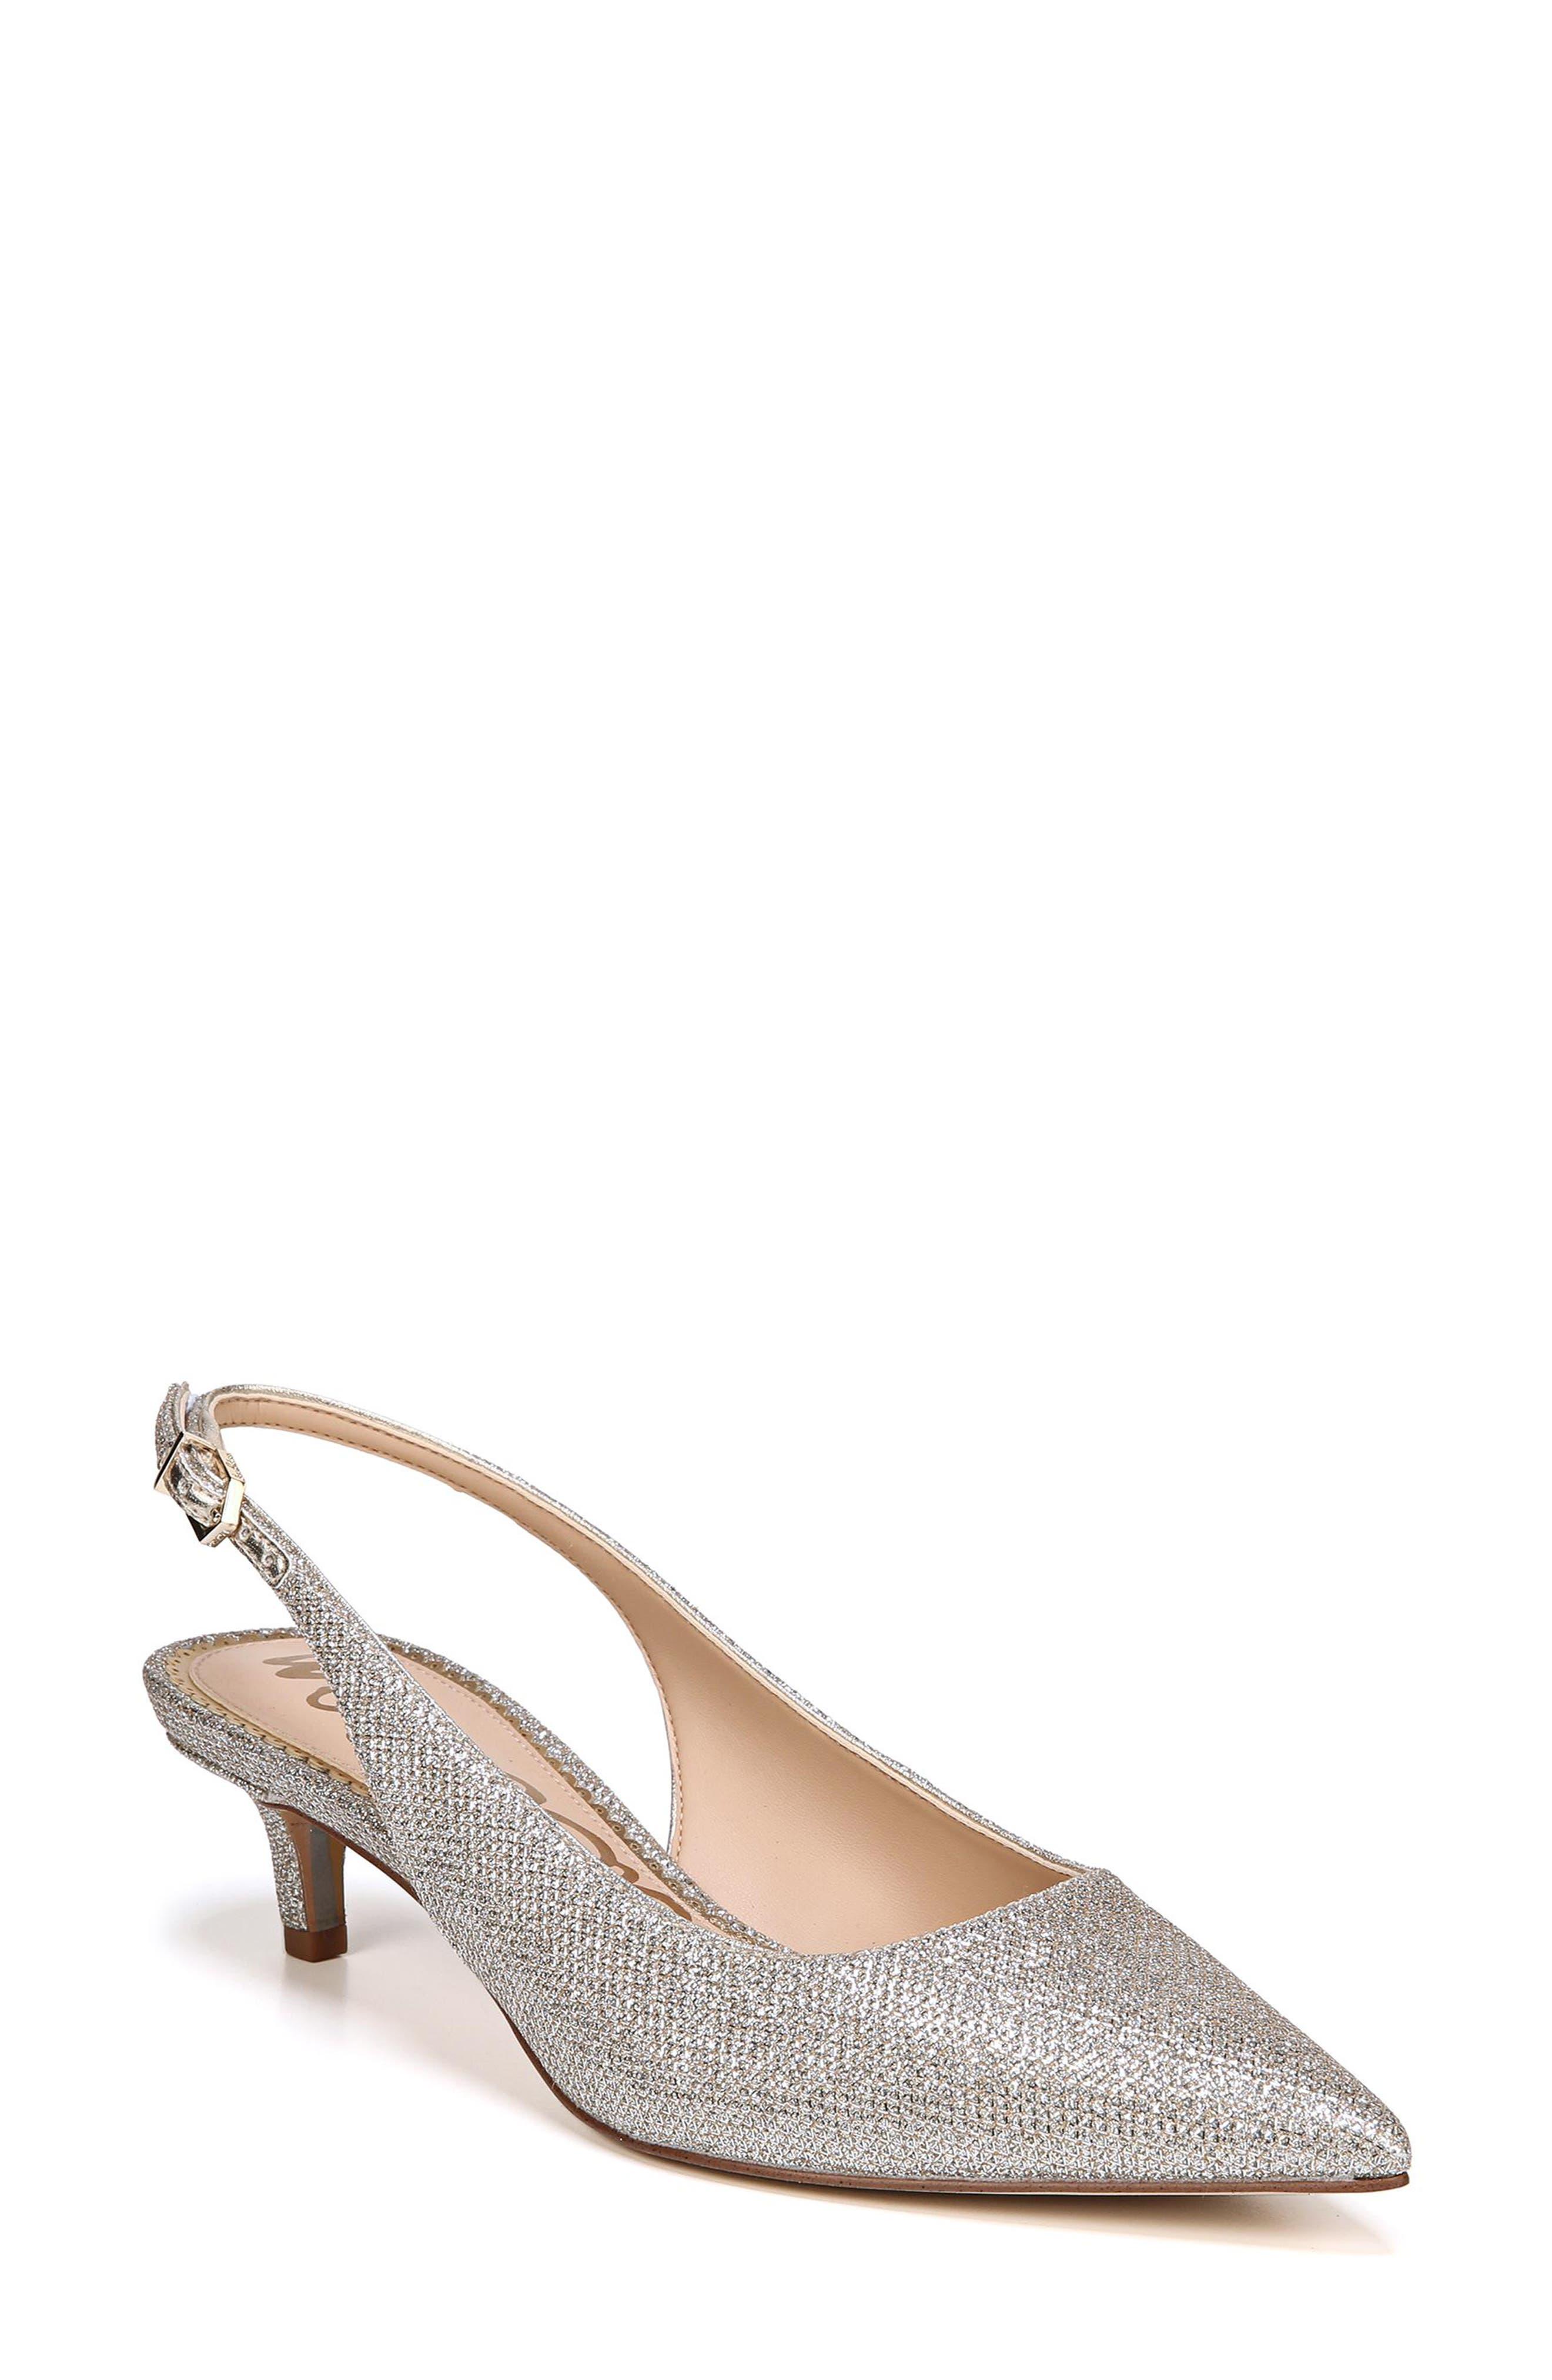 Pin Up Shoes- Heels, Pumps & Flats Womens Sam Edelman Ludlow Pump $76.96 AT vintagedancer.com